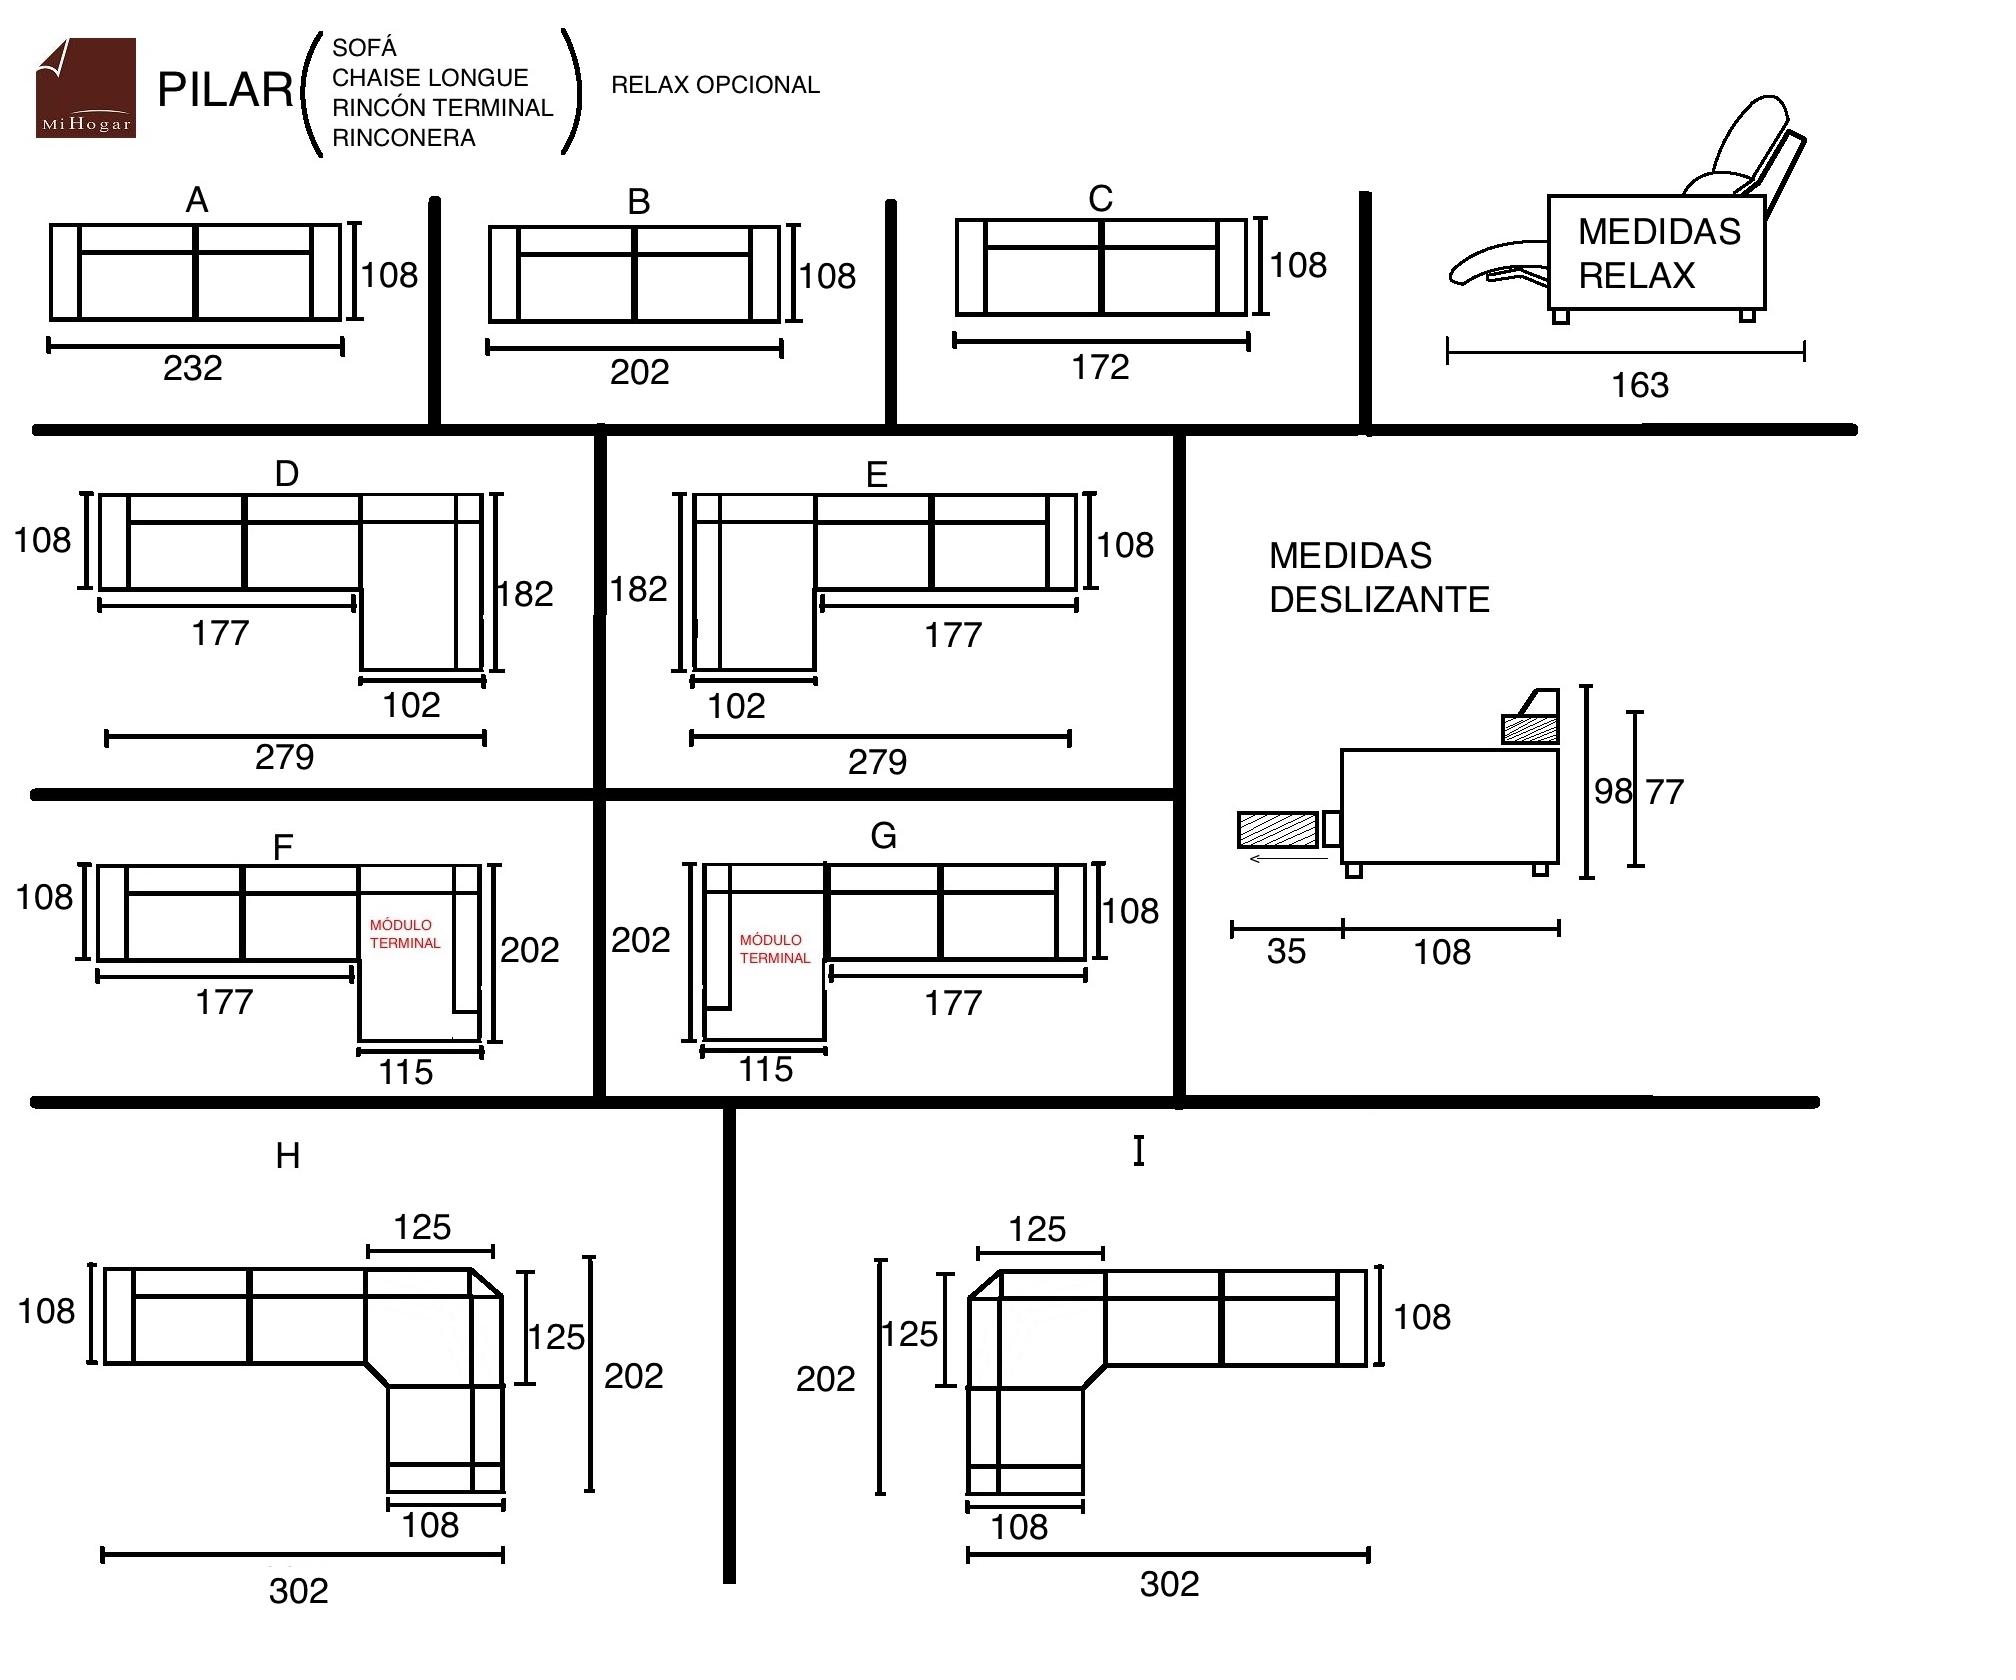 Chaise longue sof rinconera relax pilar muebles for Medidas sofa chaise longue